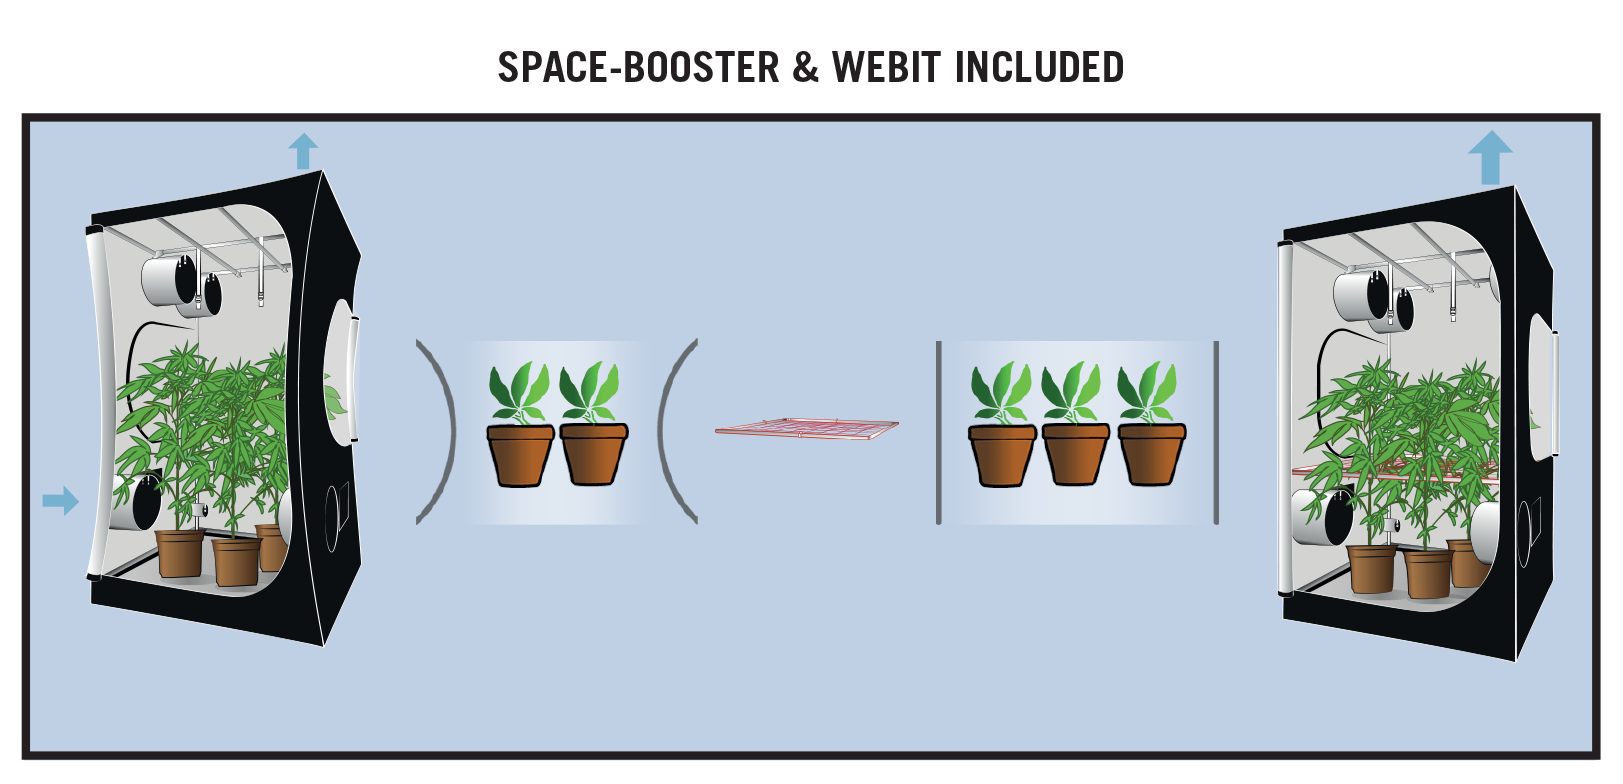 Secret Jardin Dark Room R3.00 120x120x200 см. (гроубокс для выращивания растений)